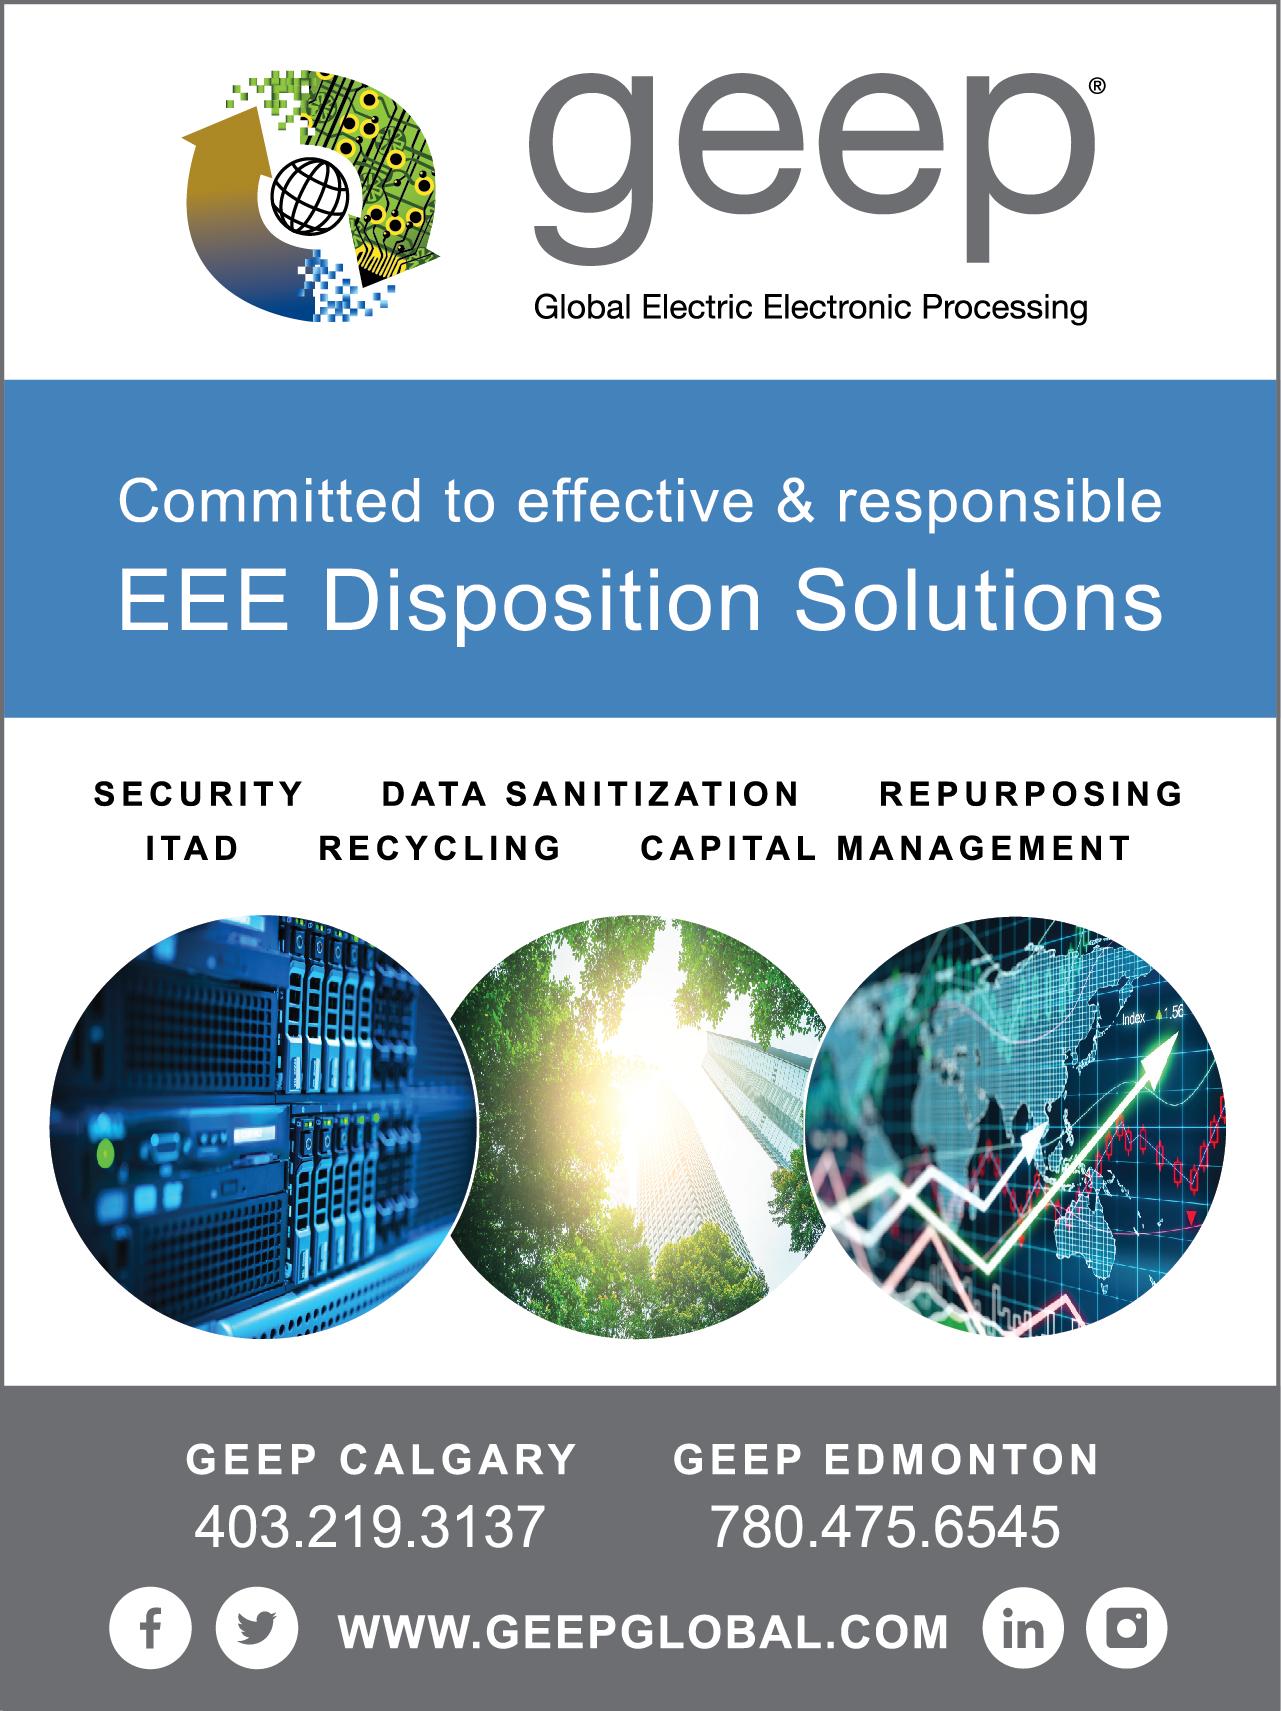 Expansion To Saskatchewans Electronics Recycling Program Responsible Solutions Winter 2018 Contents